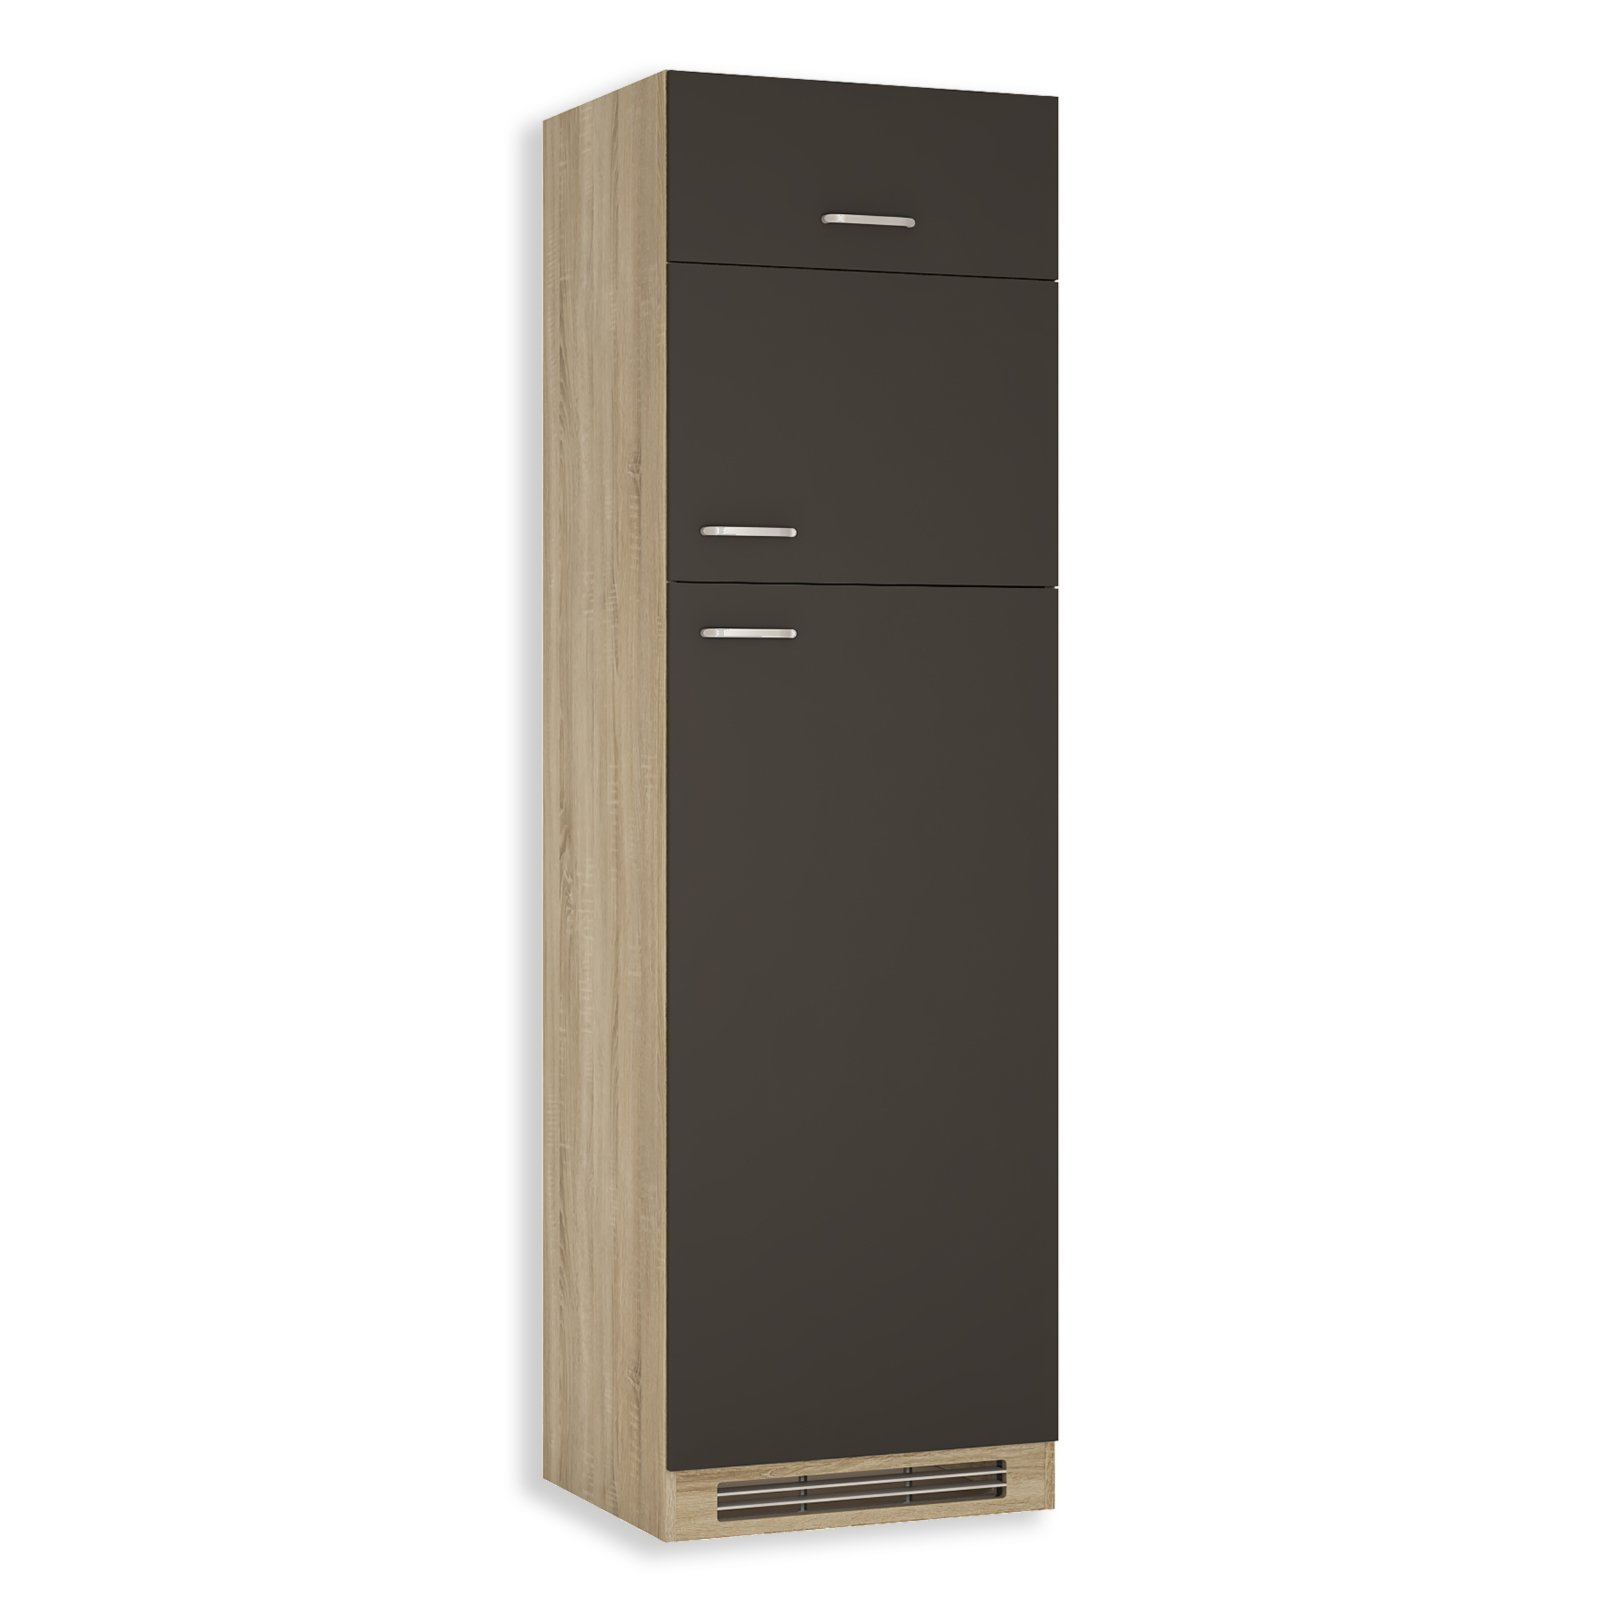 k hlschrankumbau fox anthrazit sonoma eiche 60 cm. Black Bedroom Furniture Sets. Home Design Ideas